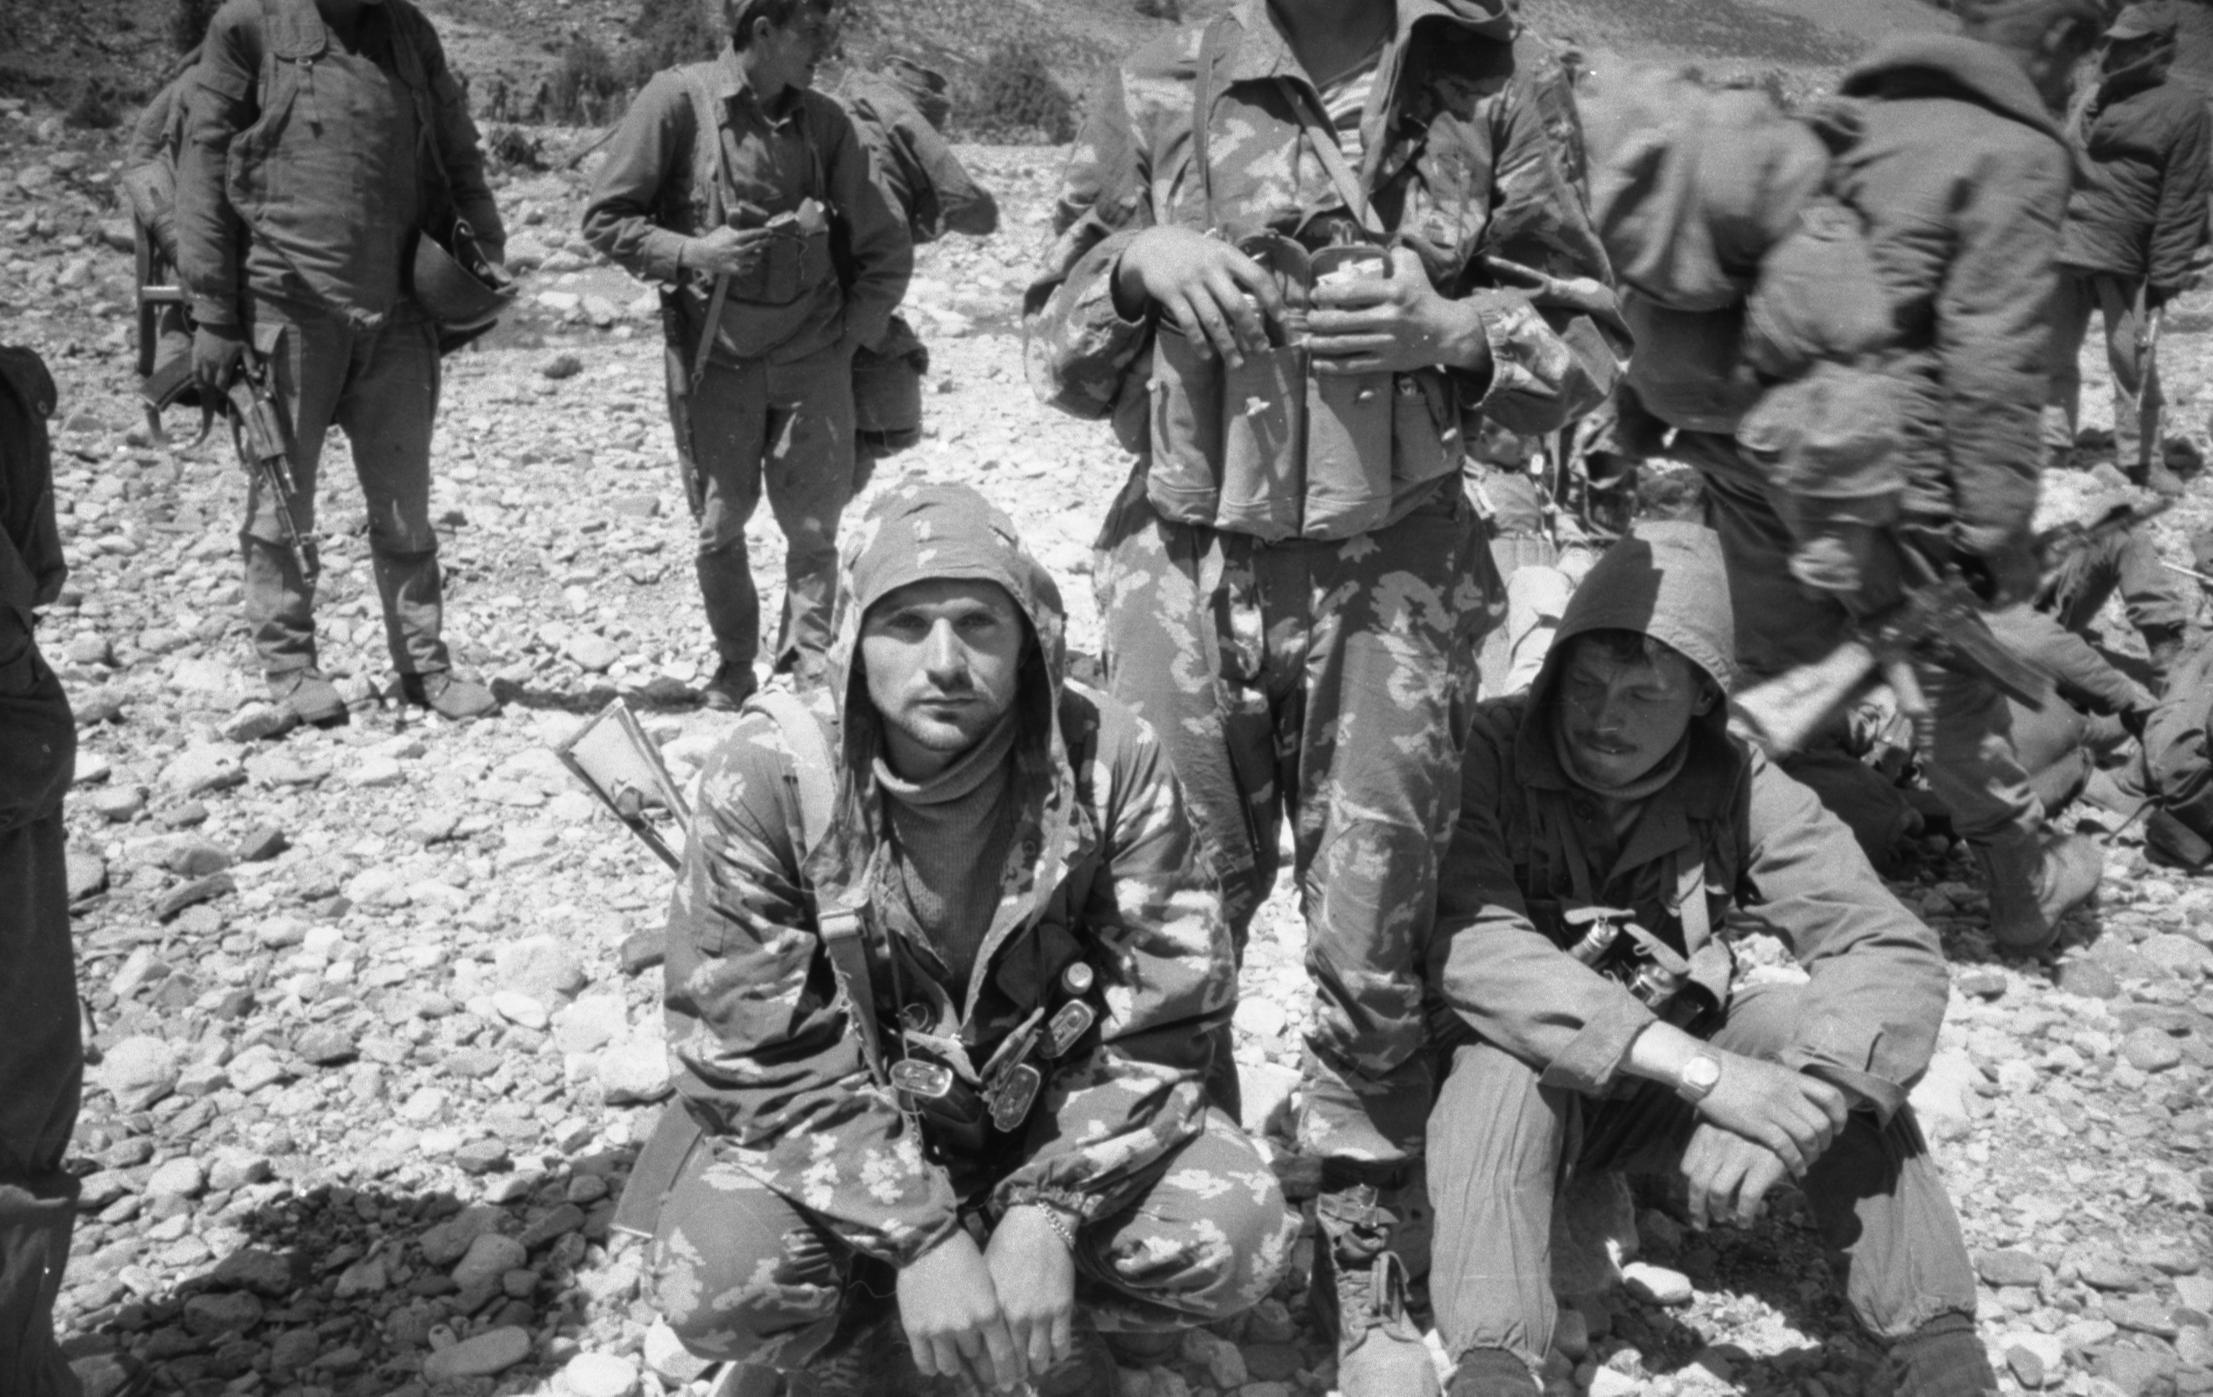 Soviet Afghanistan war - Page 7 175667